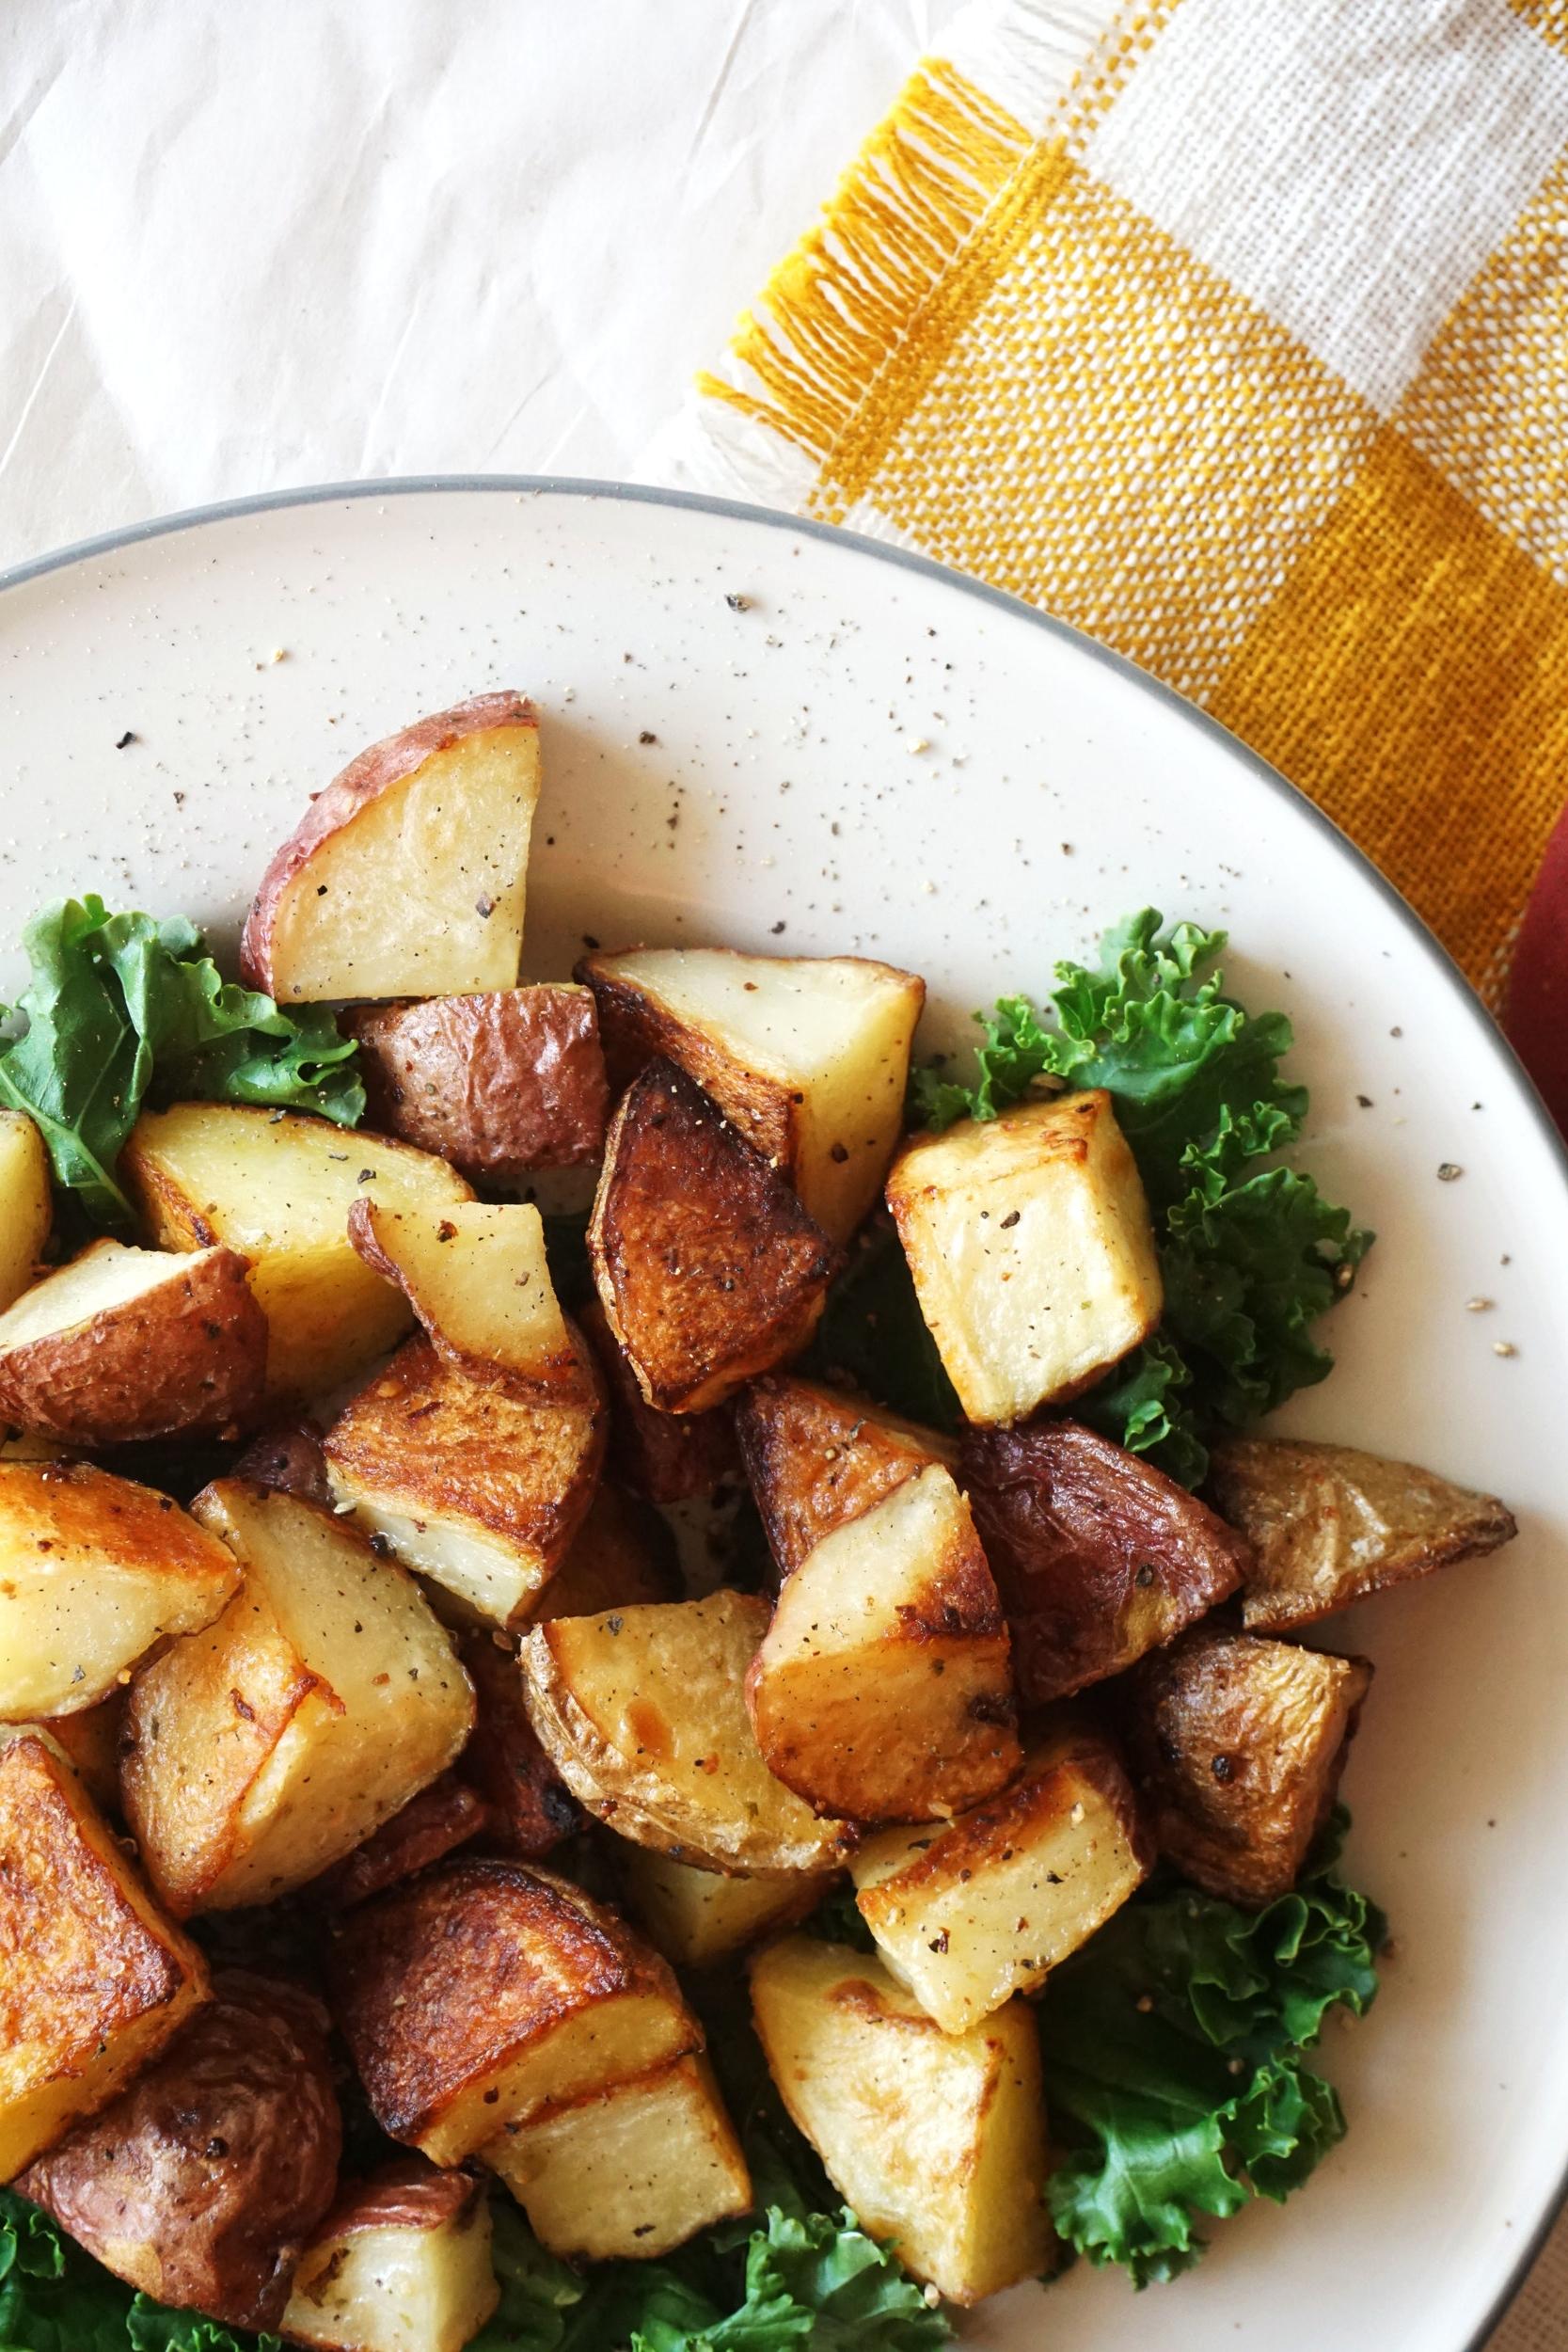 Crispy Skillet Roasted Garlic Potatoes (Vegan, GF, Paleo)